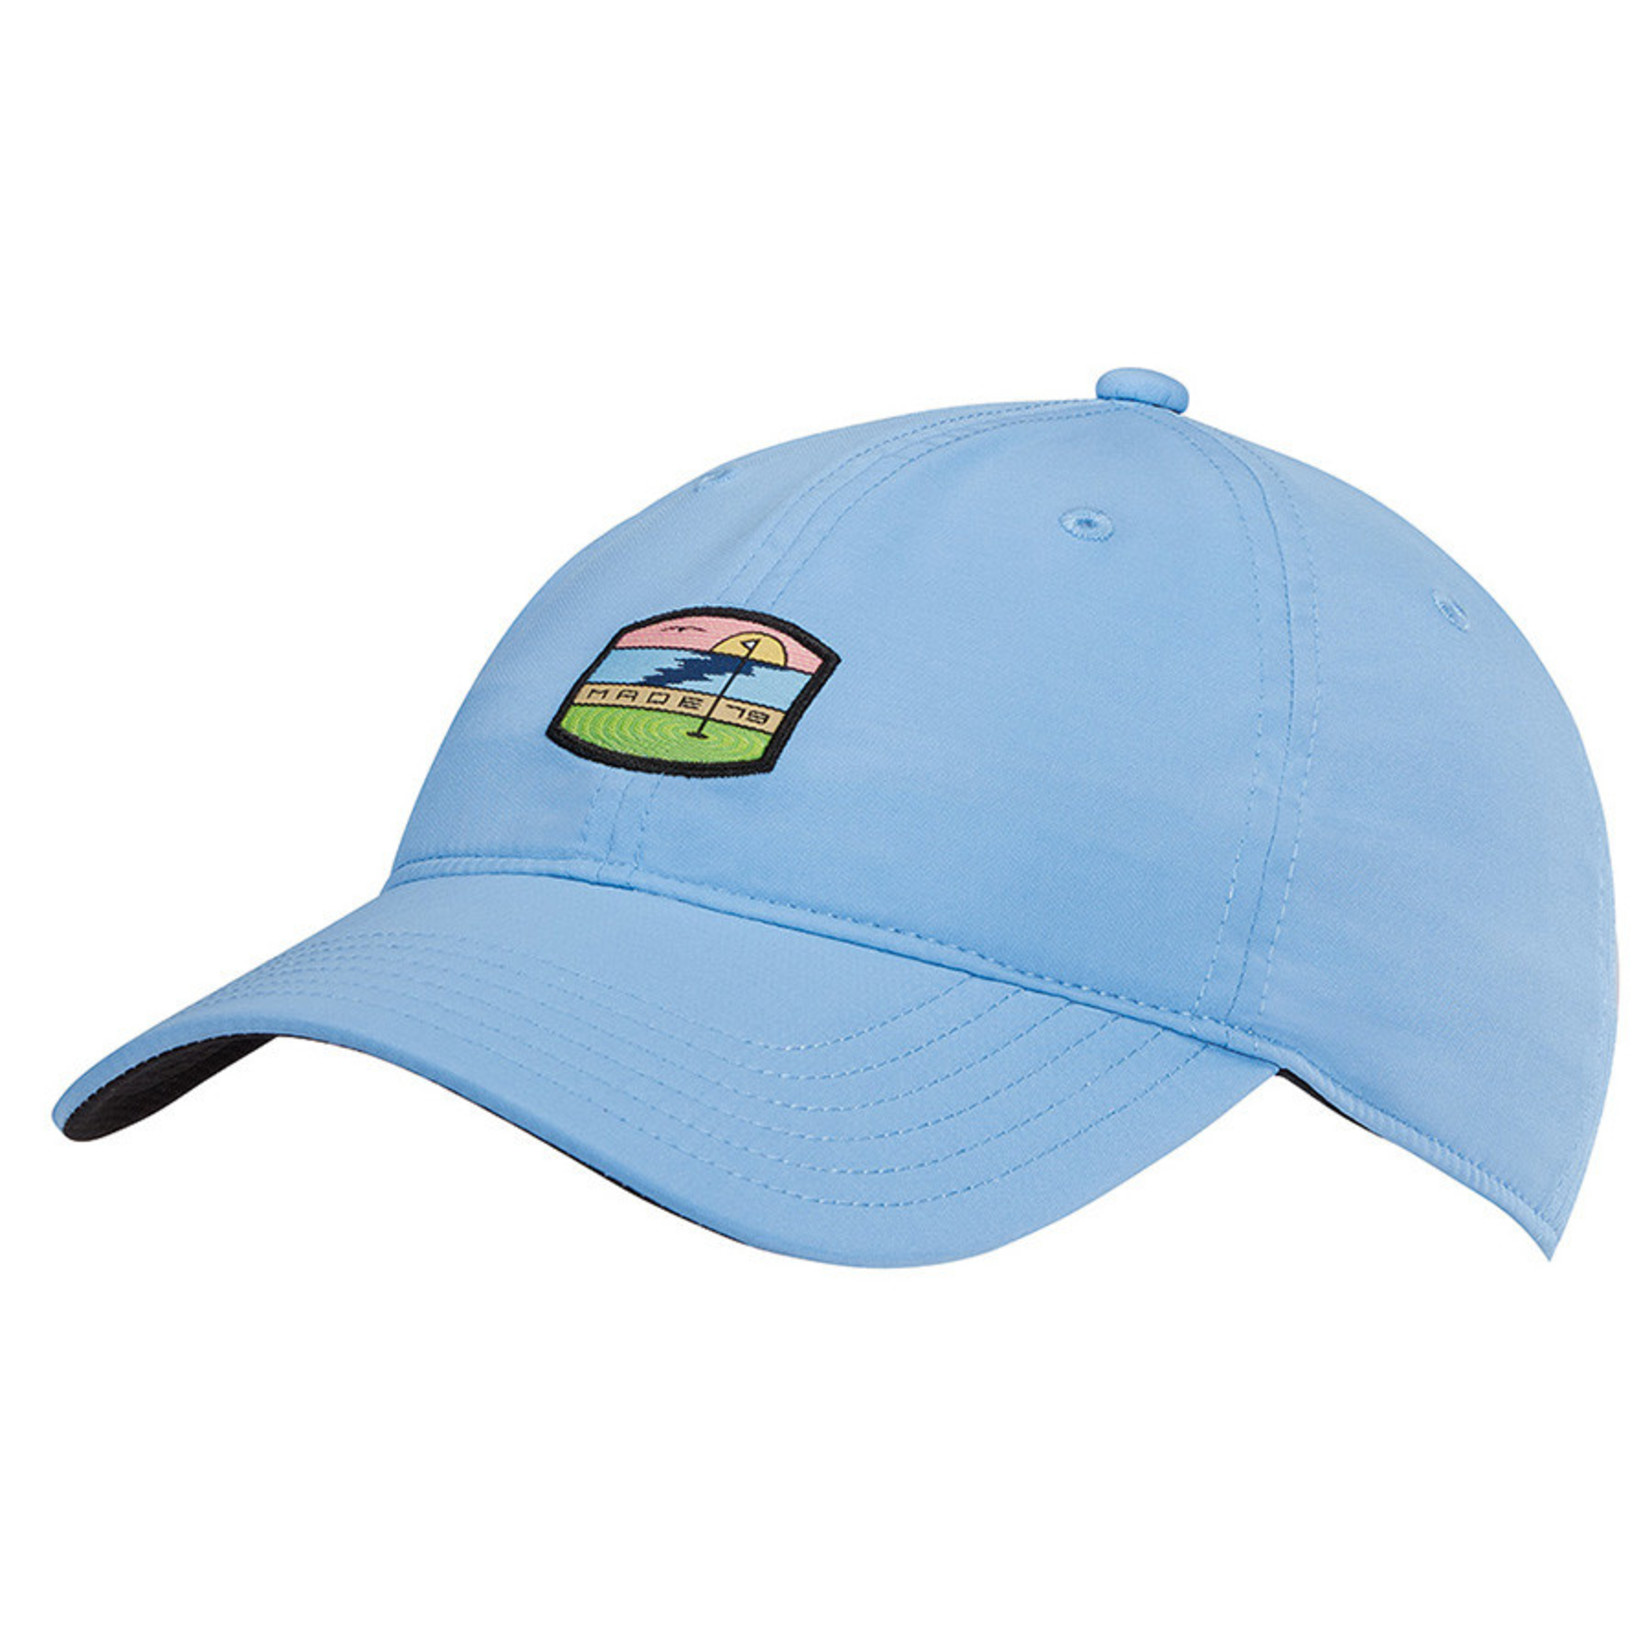 TaylorMade Miami Dad Hat